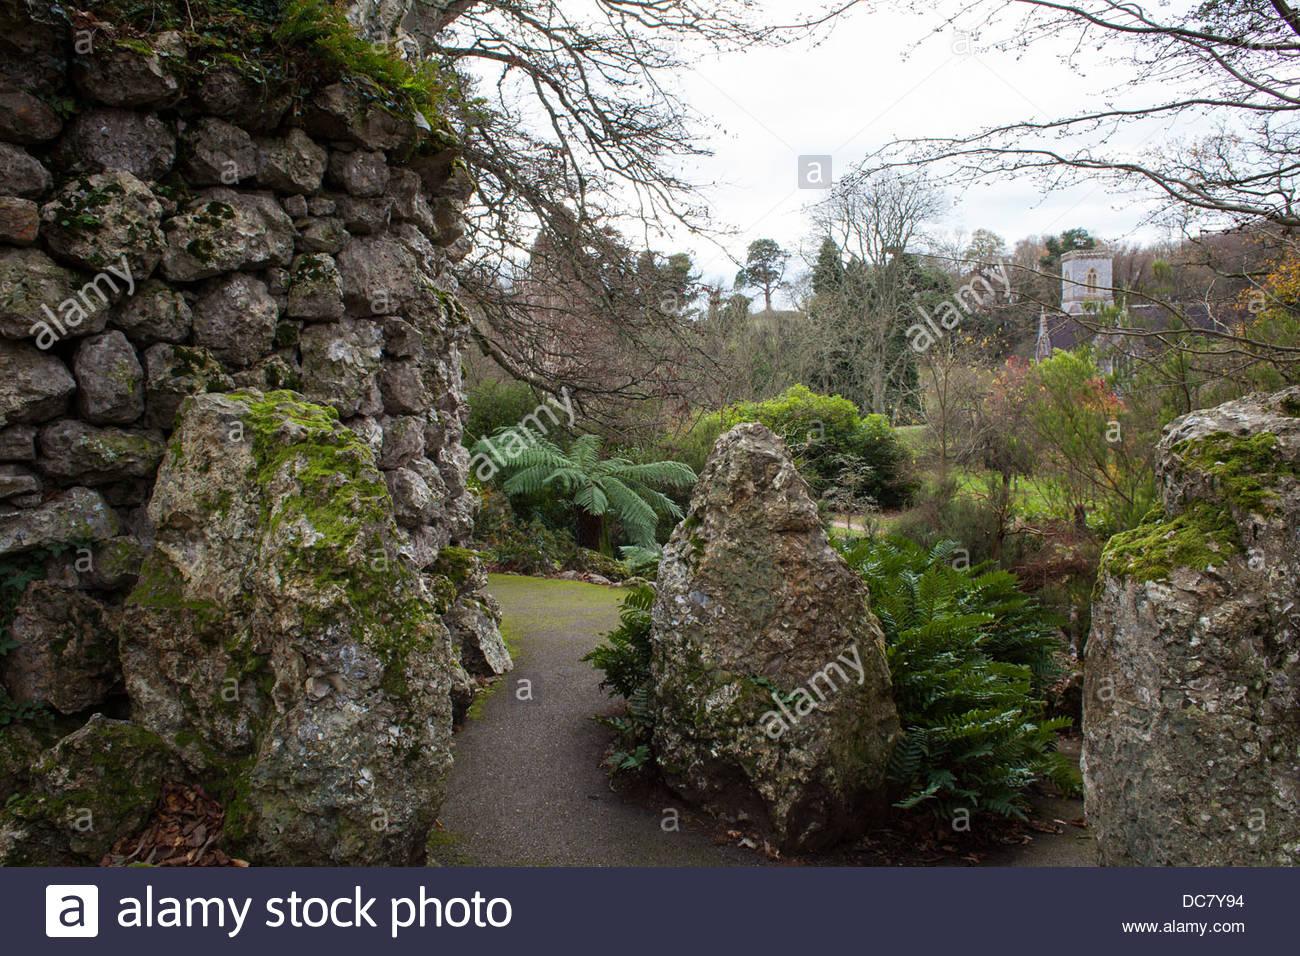 Bicton Garden Stock Photos & Bicton Garden Stock Images - Alamy